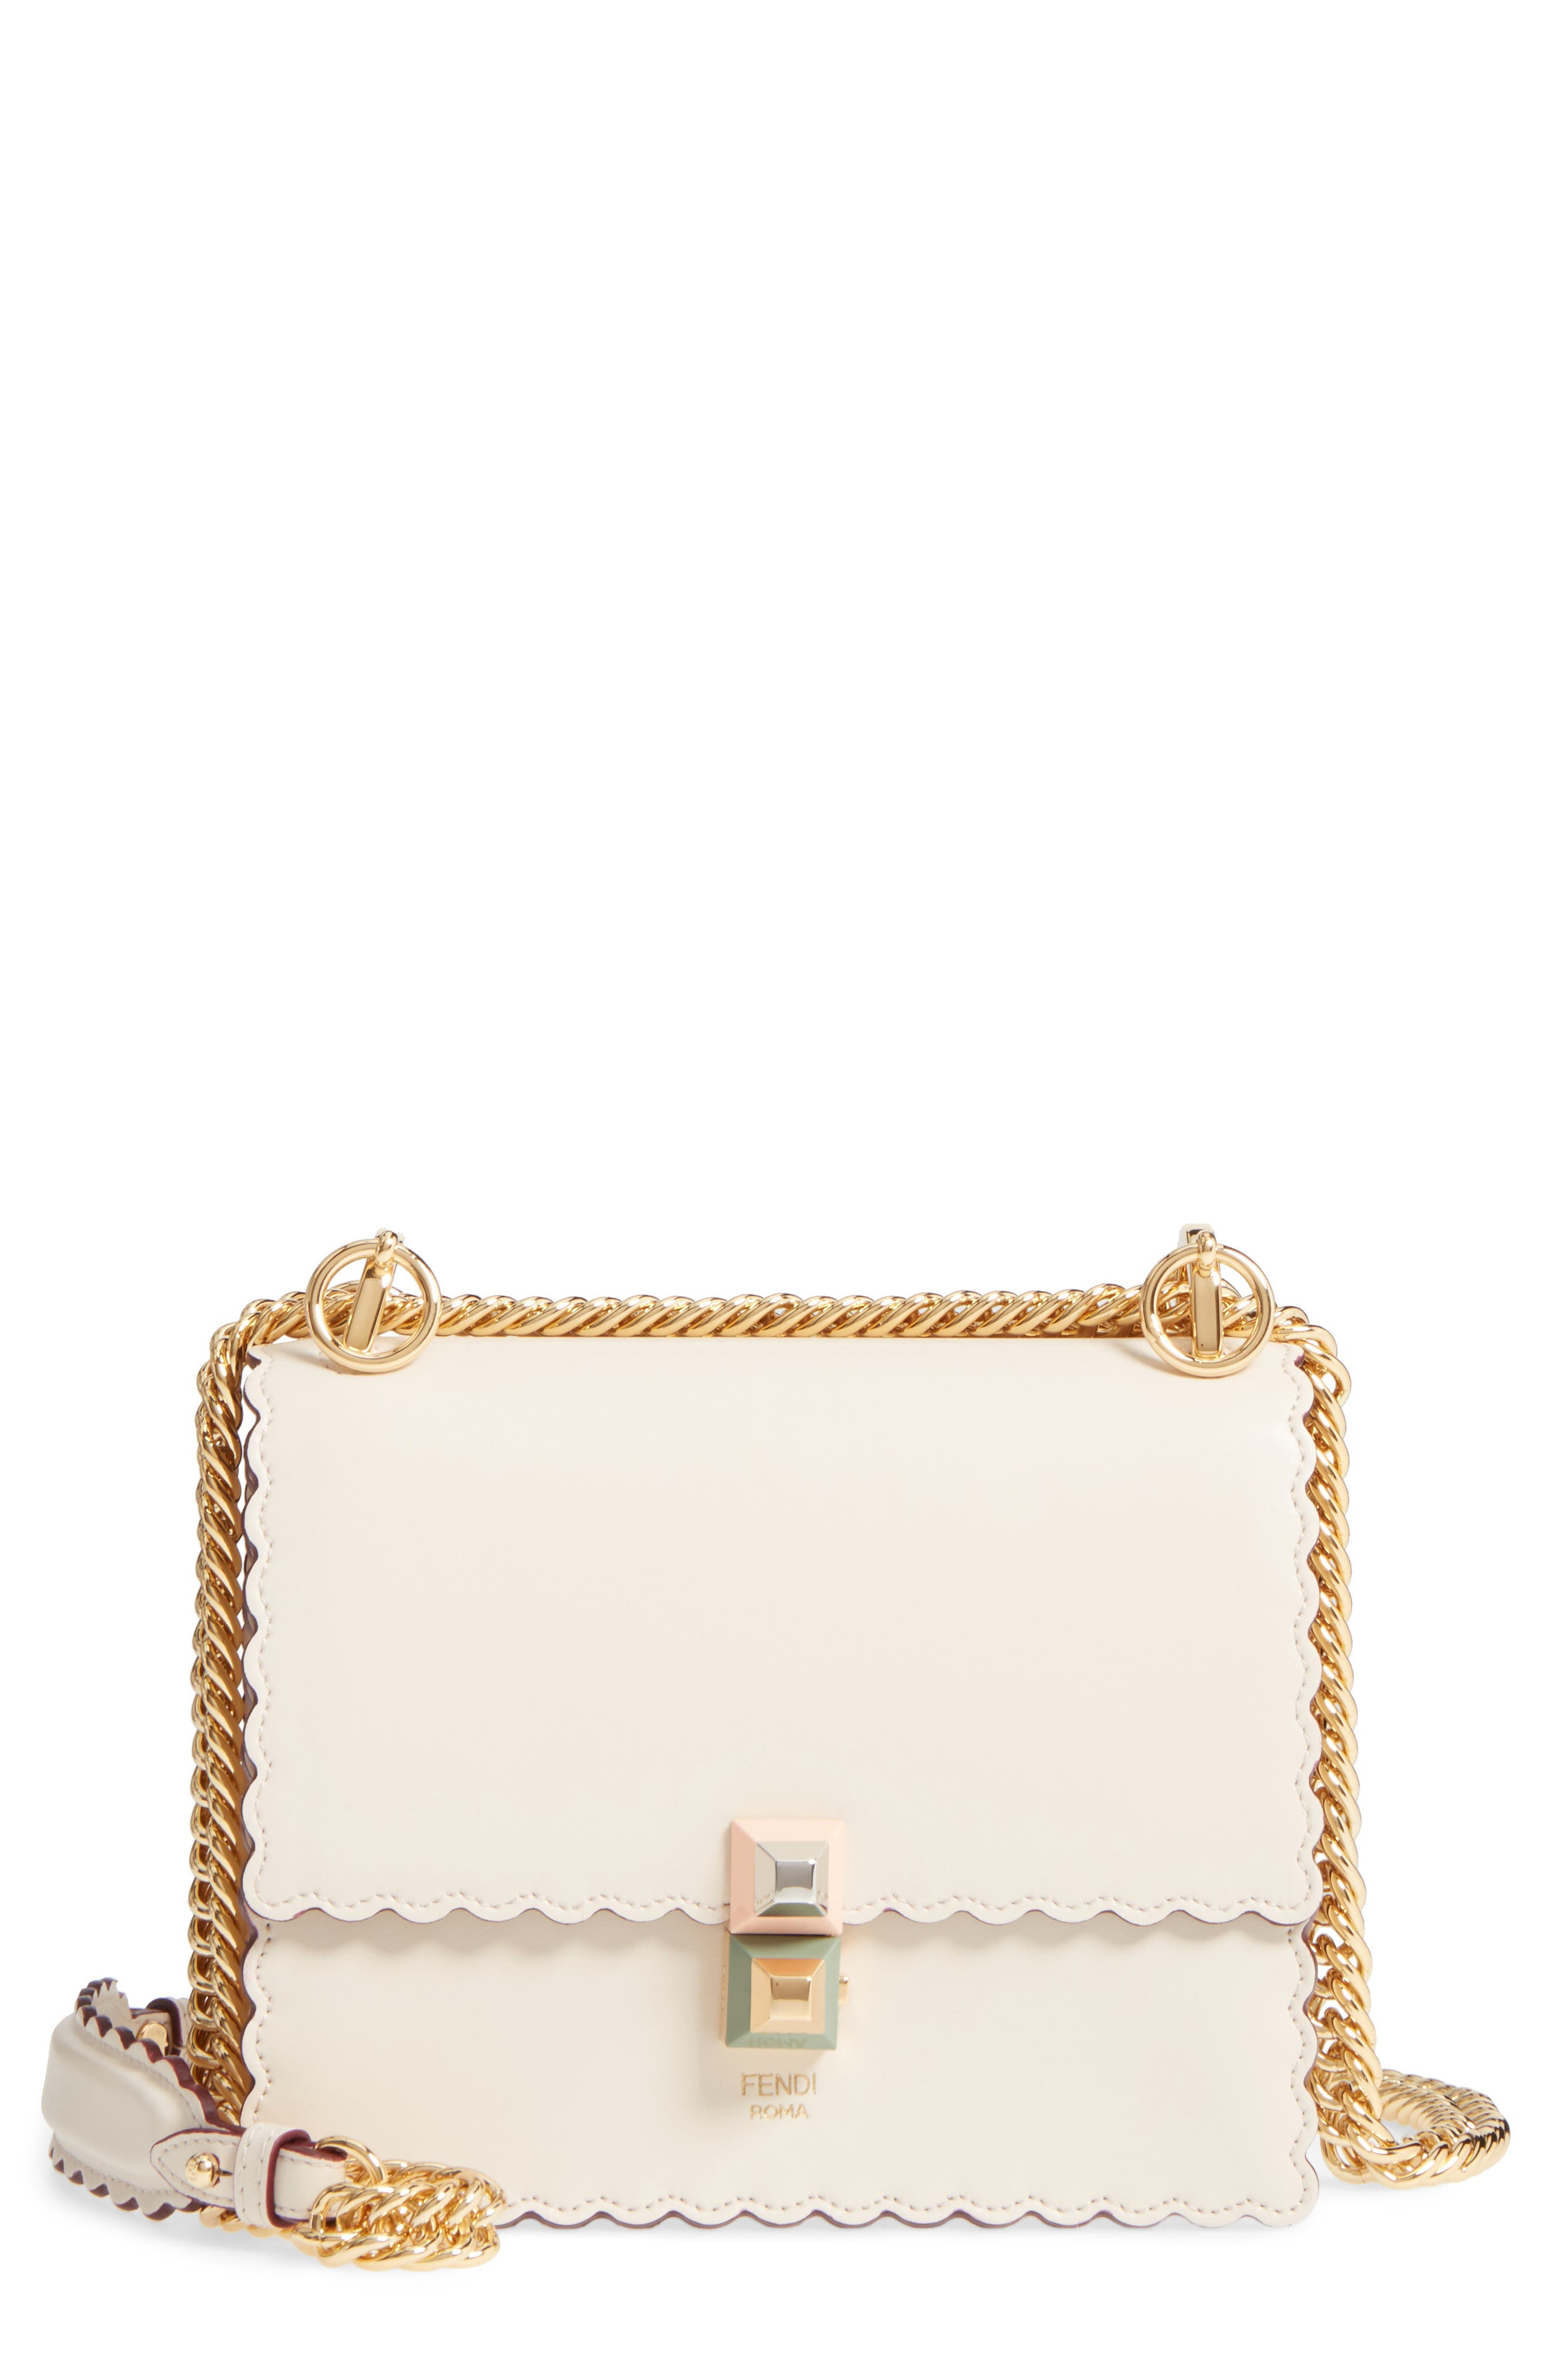 Main Image - Fendi Mini Kan I Scalloped Leather Shoulder Bag